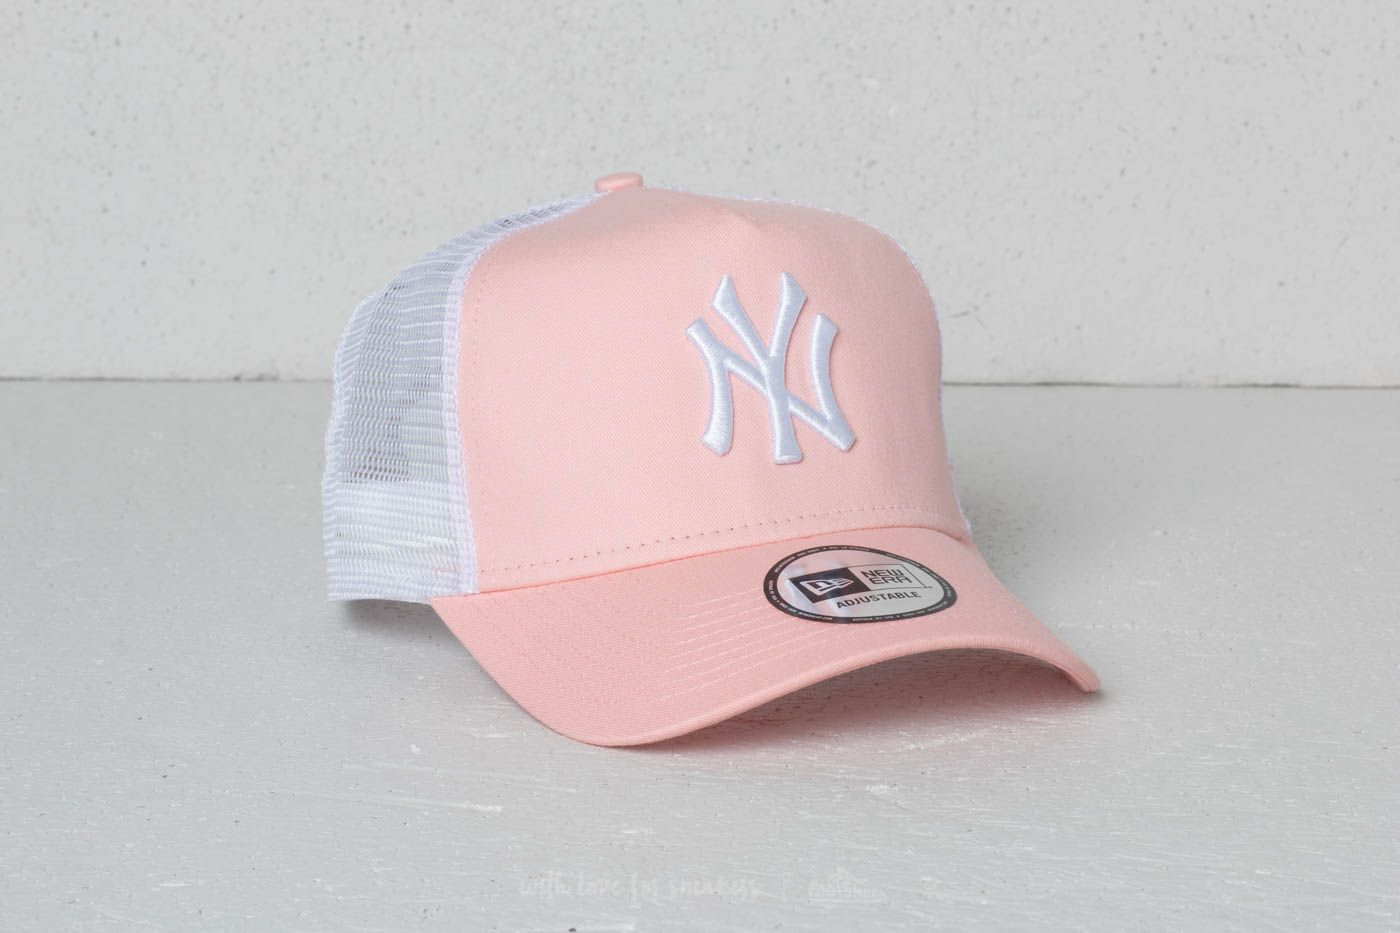 New Era 9Forty MLB League New York Yankees Cap Pink  White ... 4d12cba7821